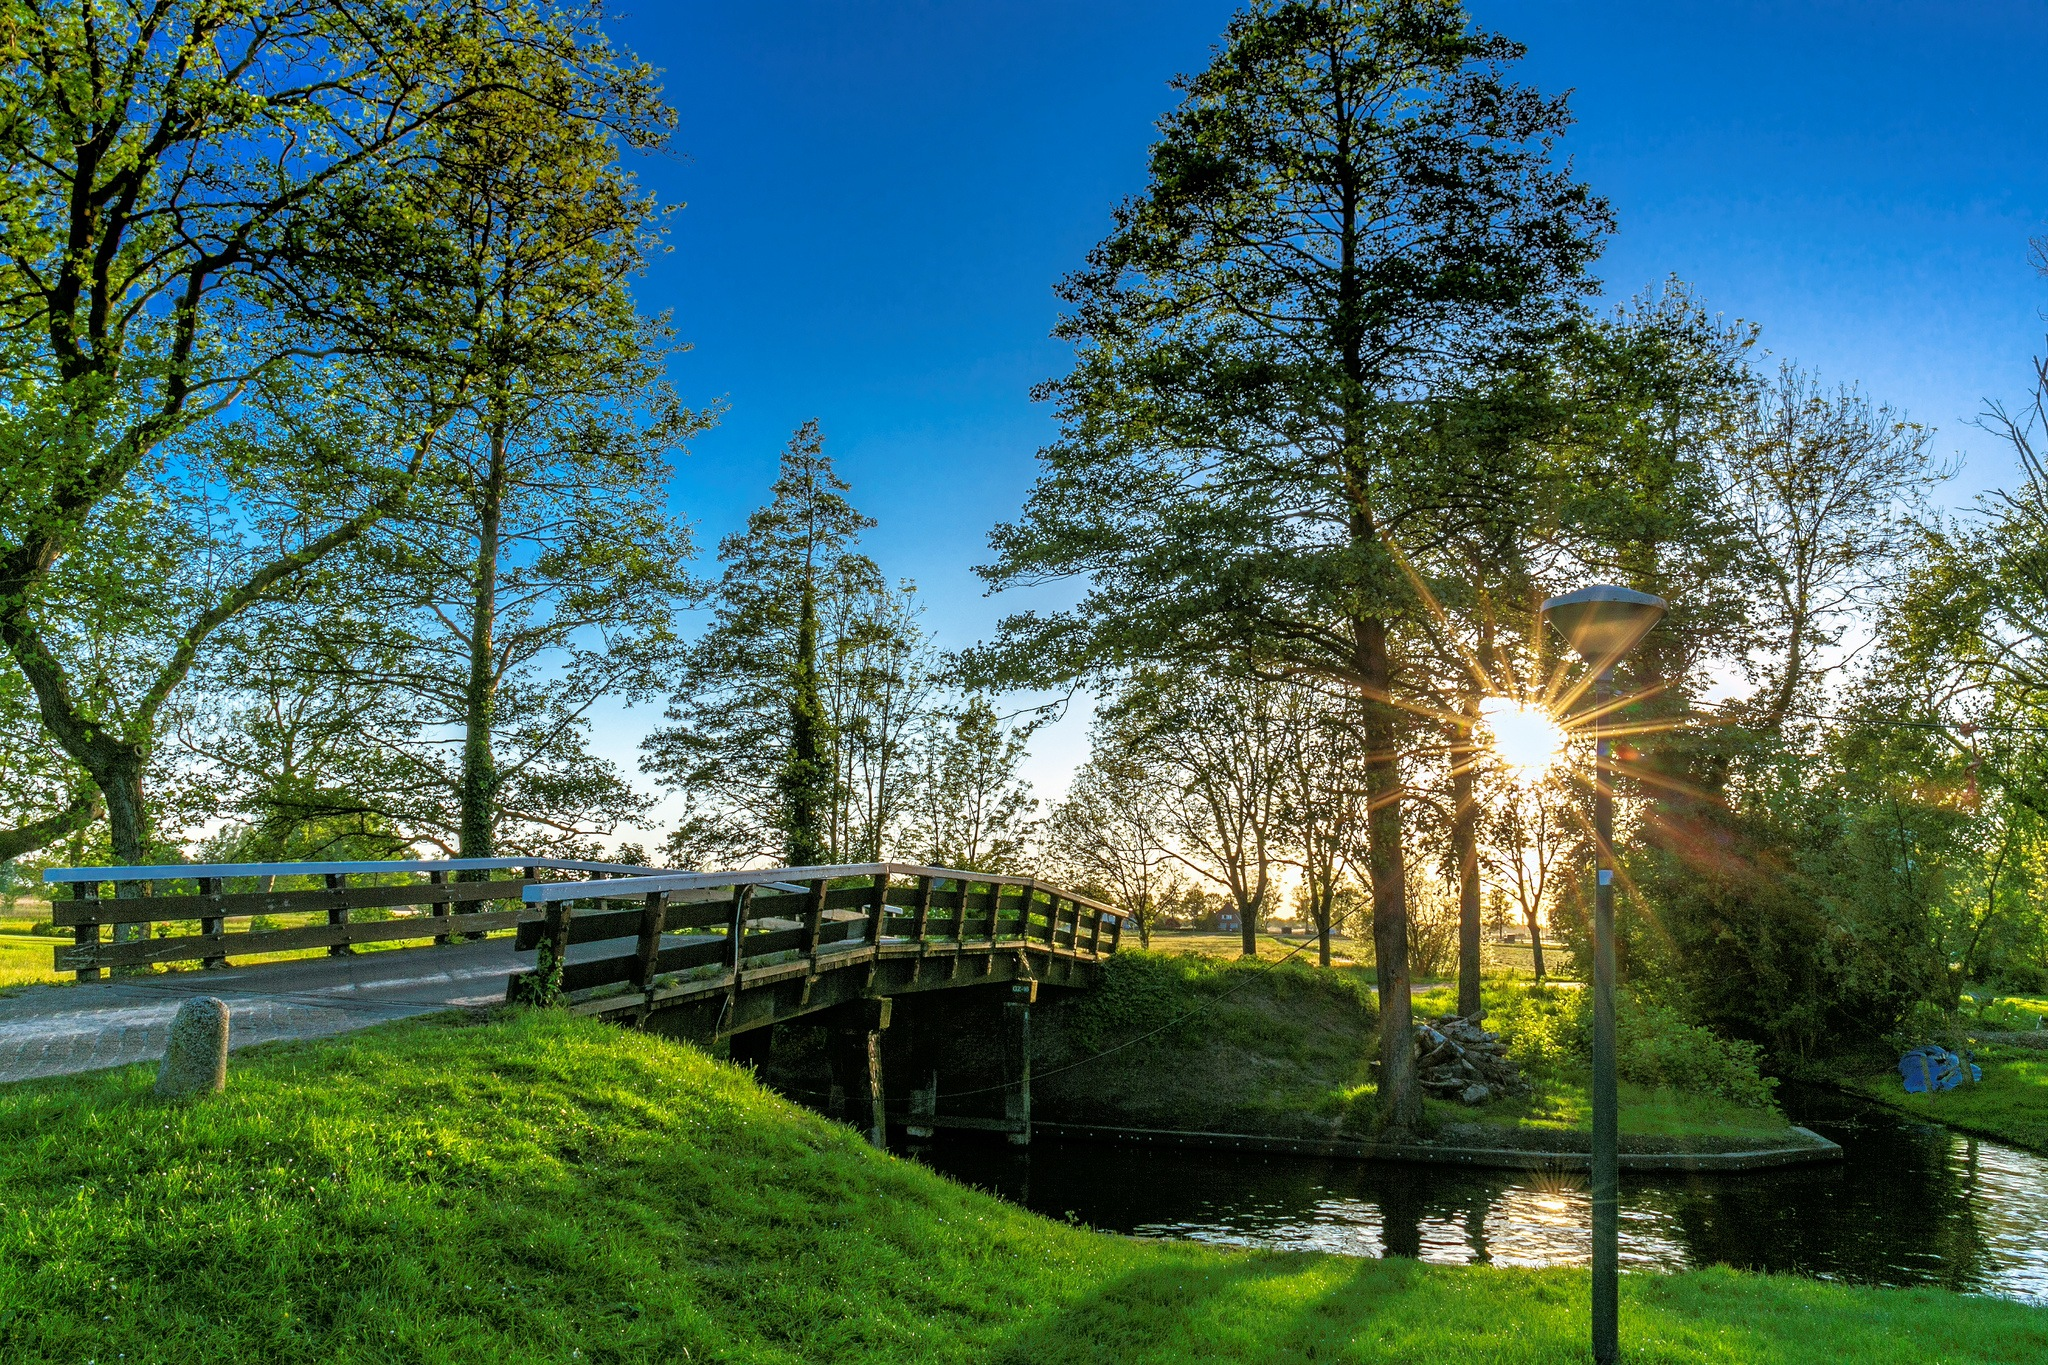 Giethoorn, Netherlands by Vincent Chang